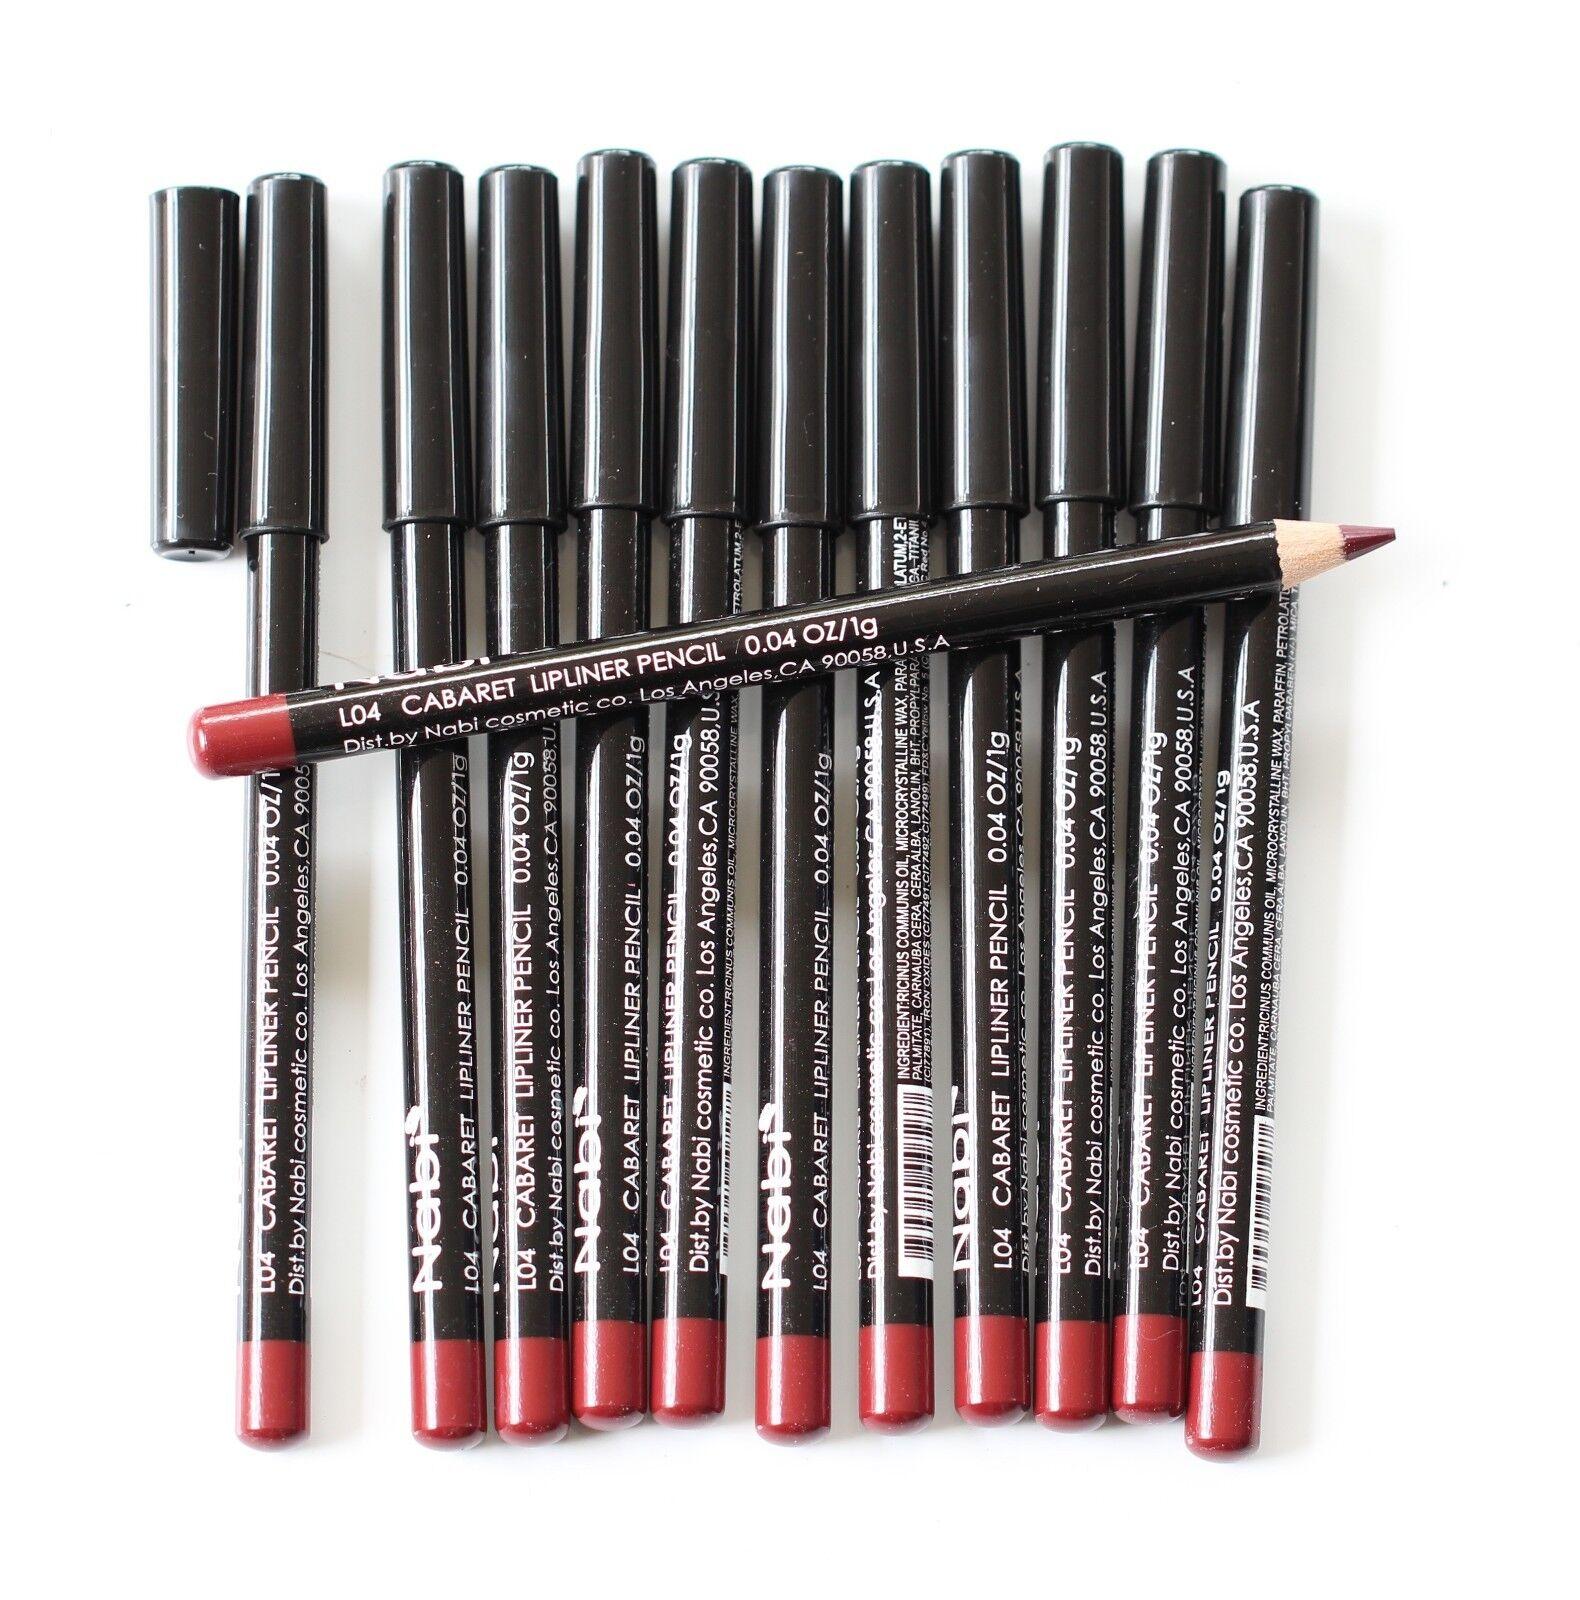 12 pcs NABI L04 CABARET Lip Liner Lipliner Pencil